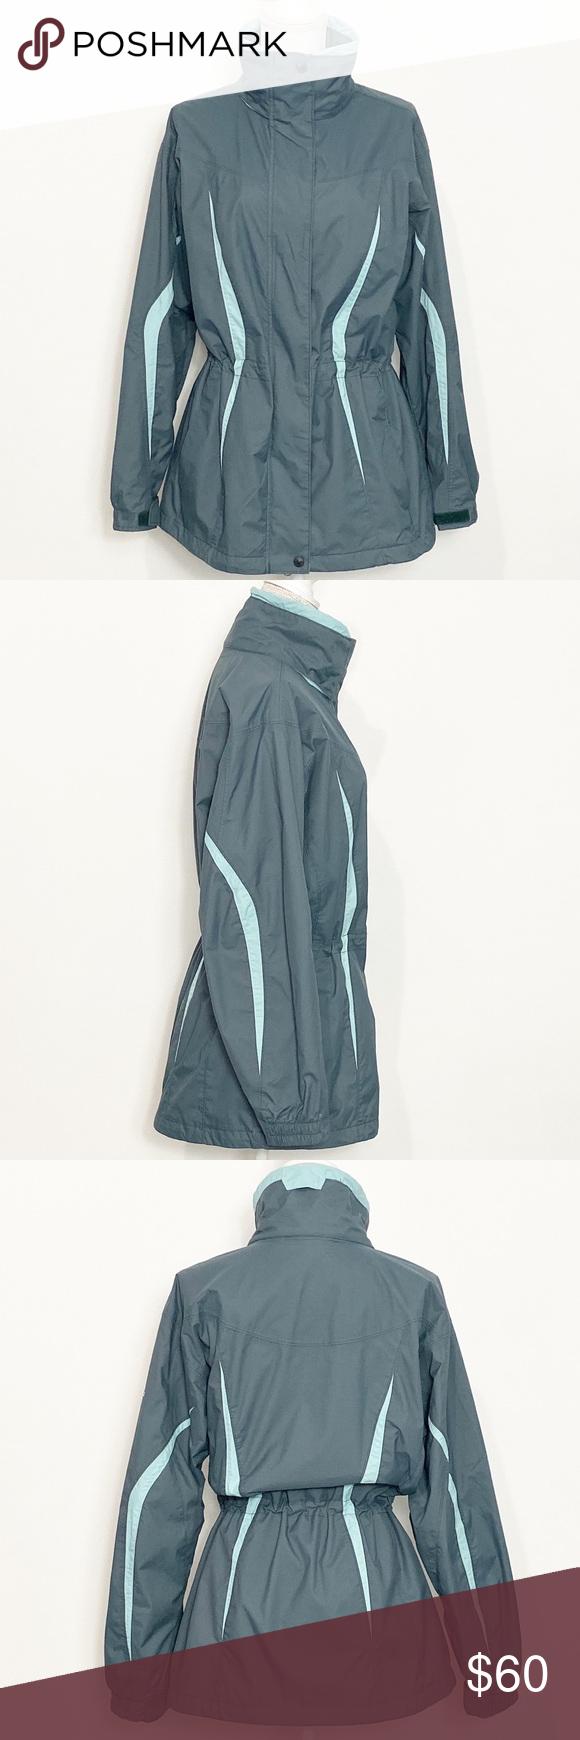 Columbia Jacket Size Large Columbia Waterproof Jacket Waterproof Omni Tech Sealant Fully Lined Zip Snap Closure Windbreaker Jacket Jackets Clothes Design